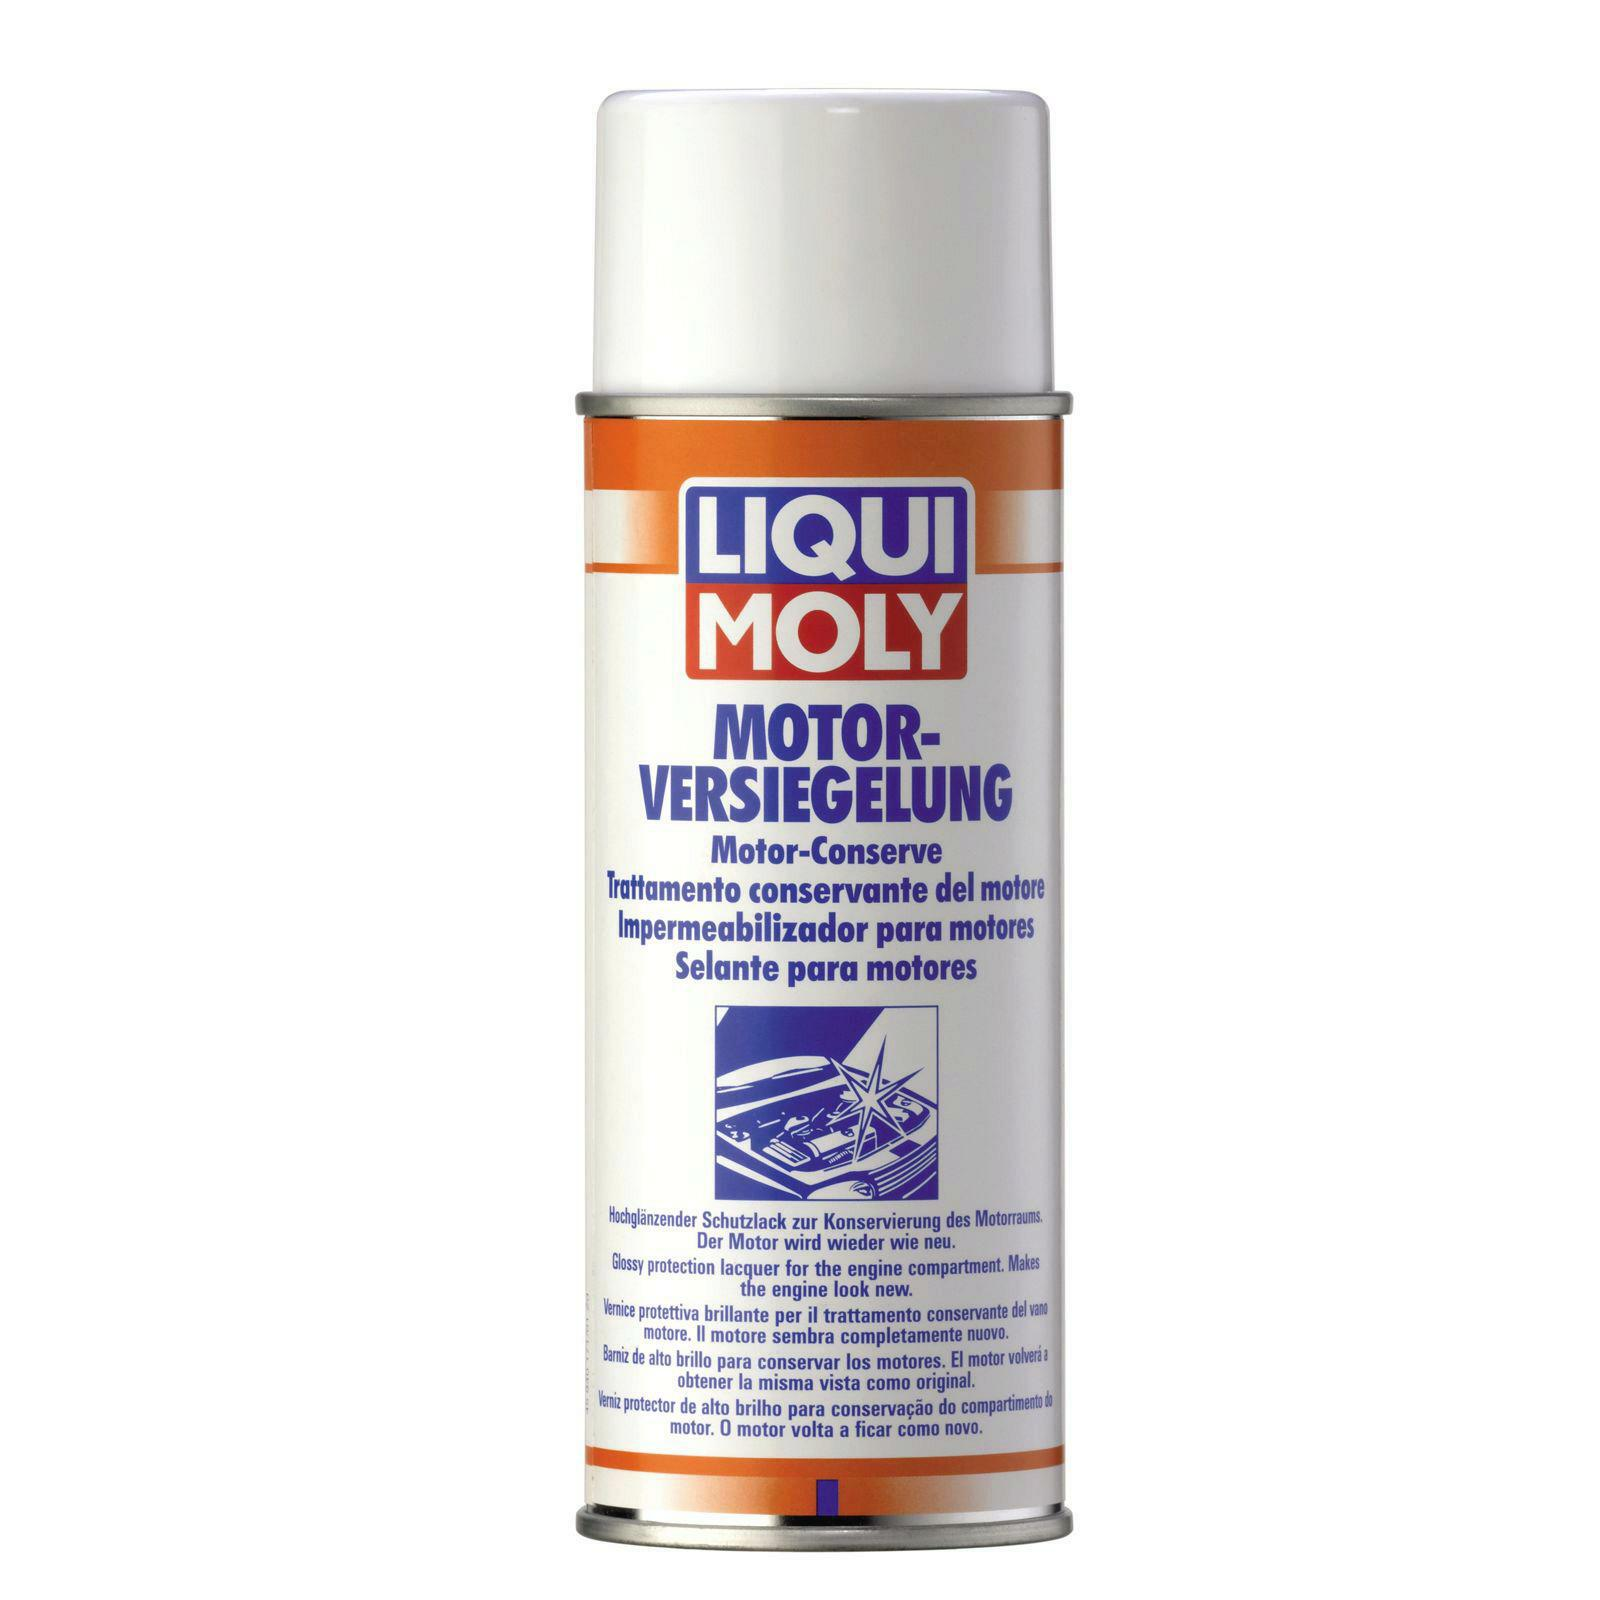 Liqui Moly Motor-Versiegelung 300ml